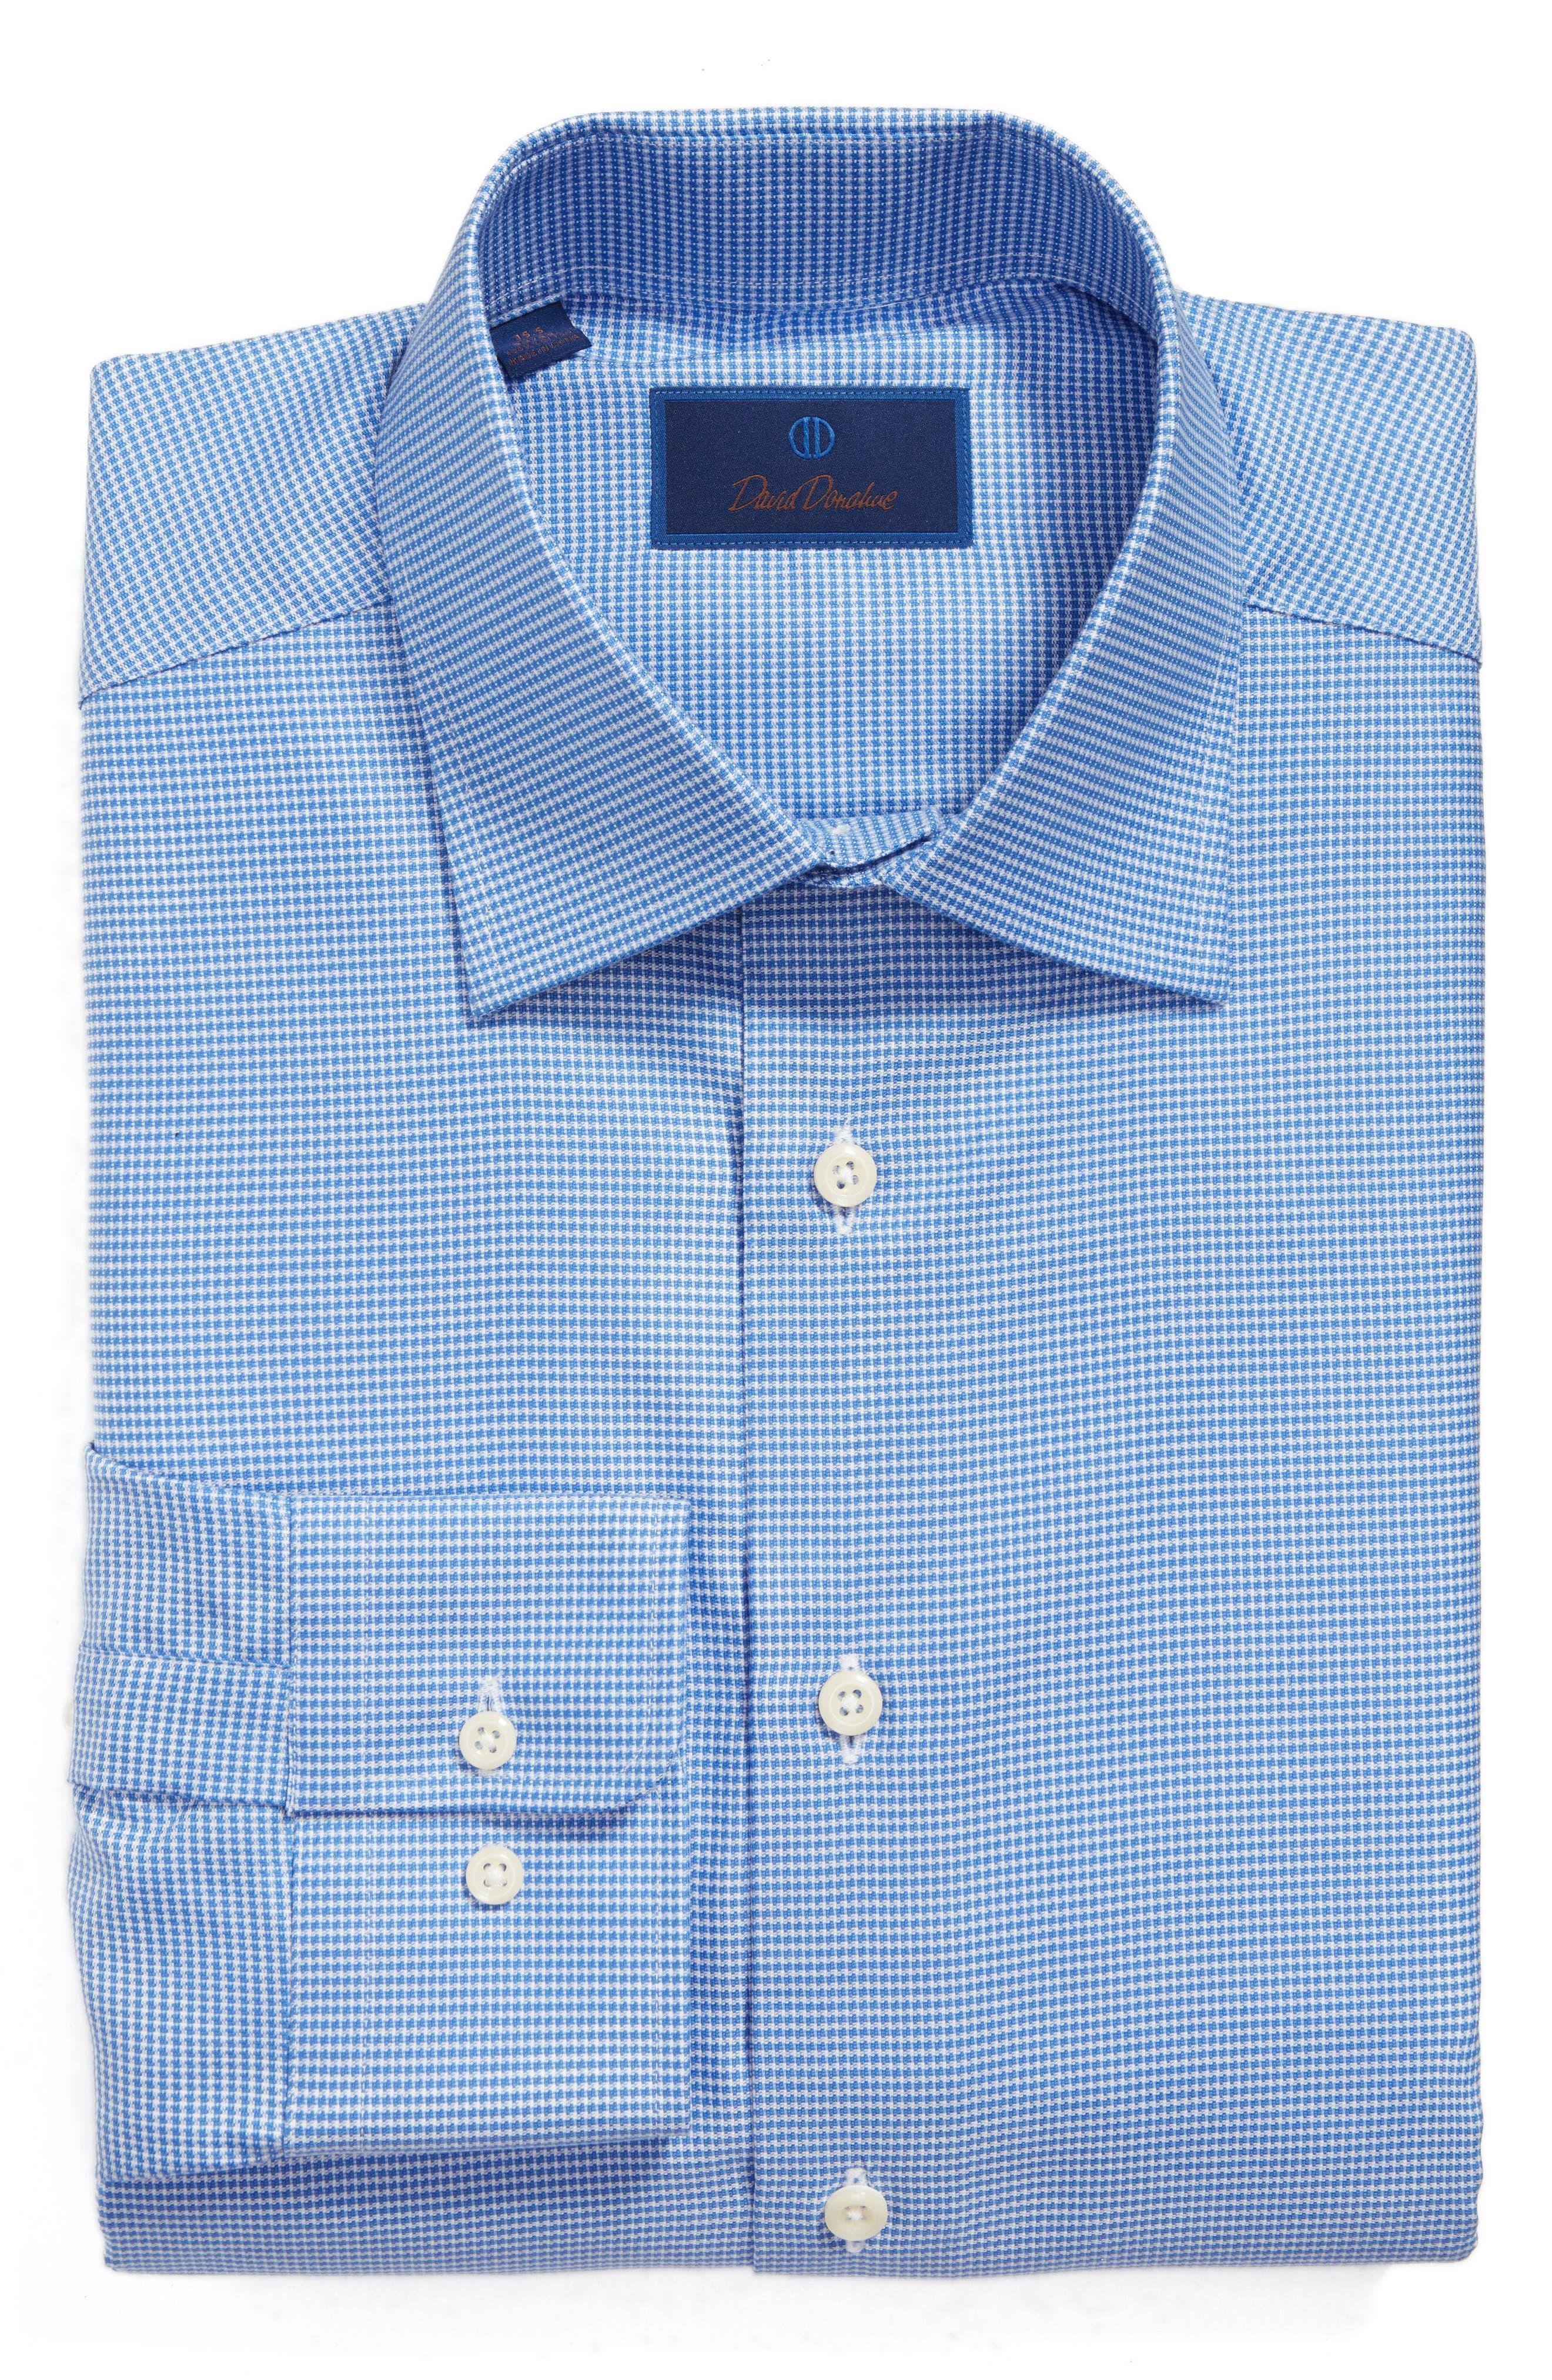 Regular Fit Houndstooth Dress Shirt,                             Alternate thumbnail 3, color,                             423